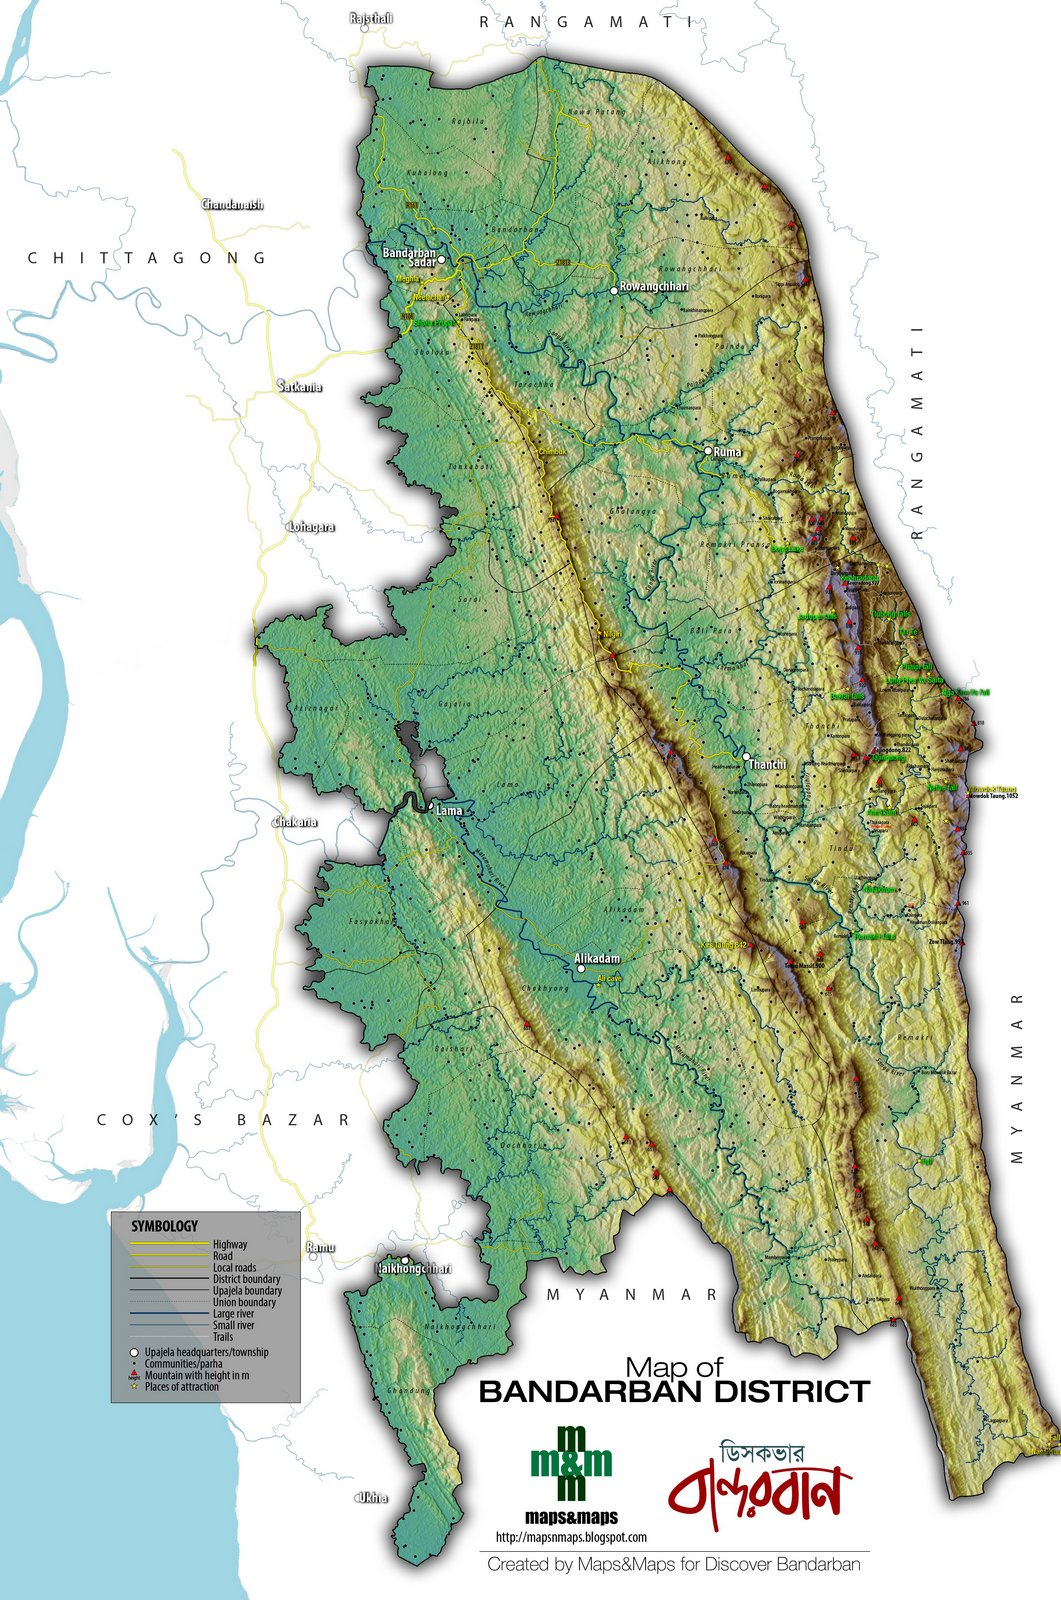 Mapsmaps map of bandarban district bangladesh map of bandarban district bangladesh gumiabroncs Gallery